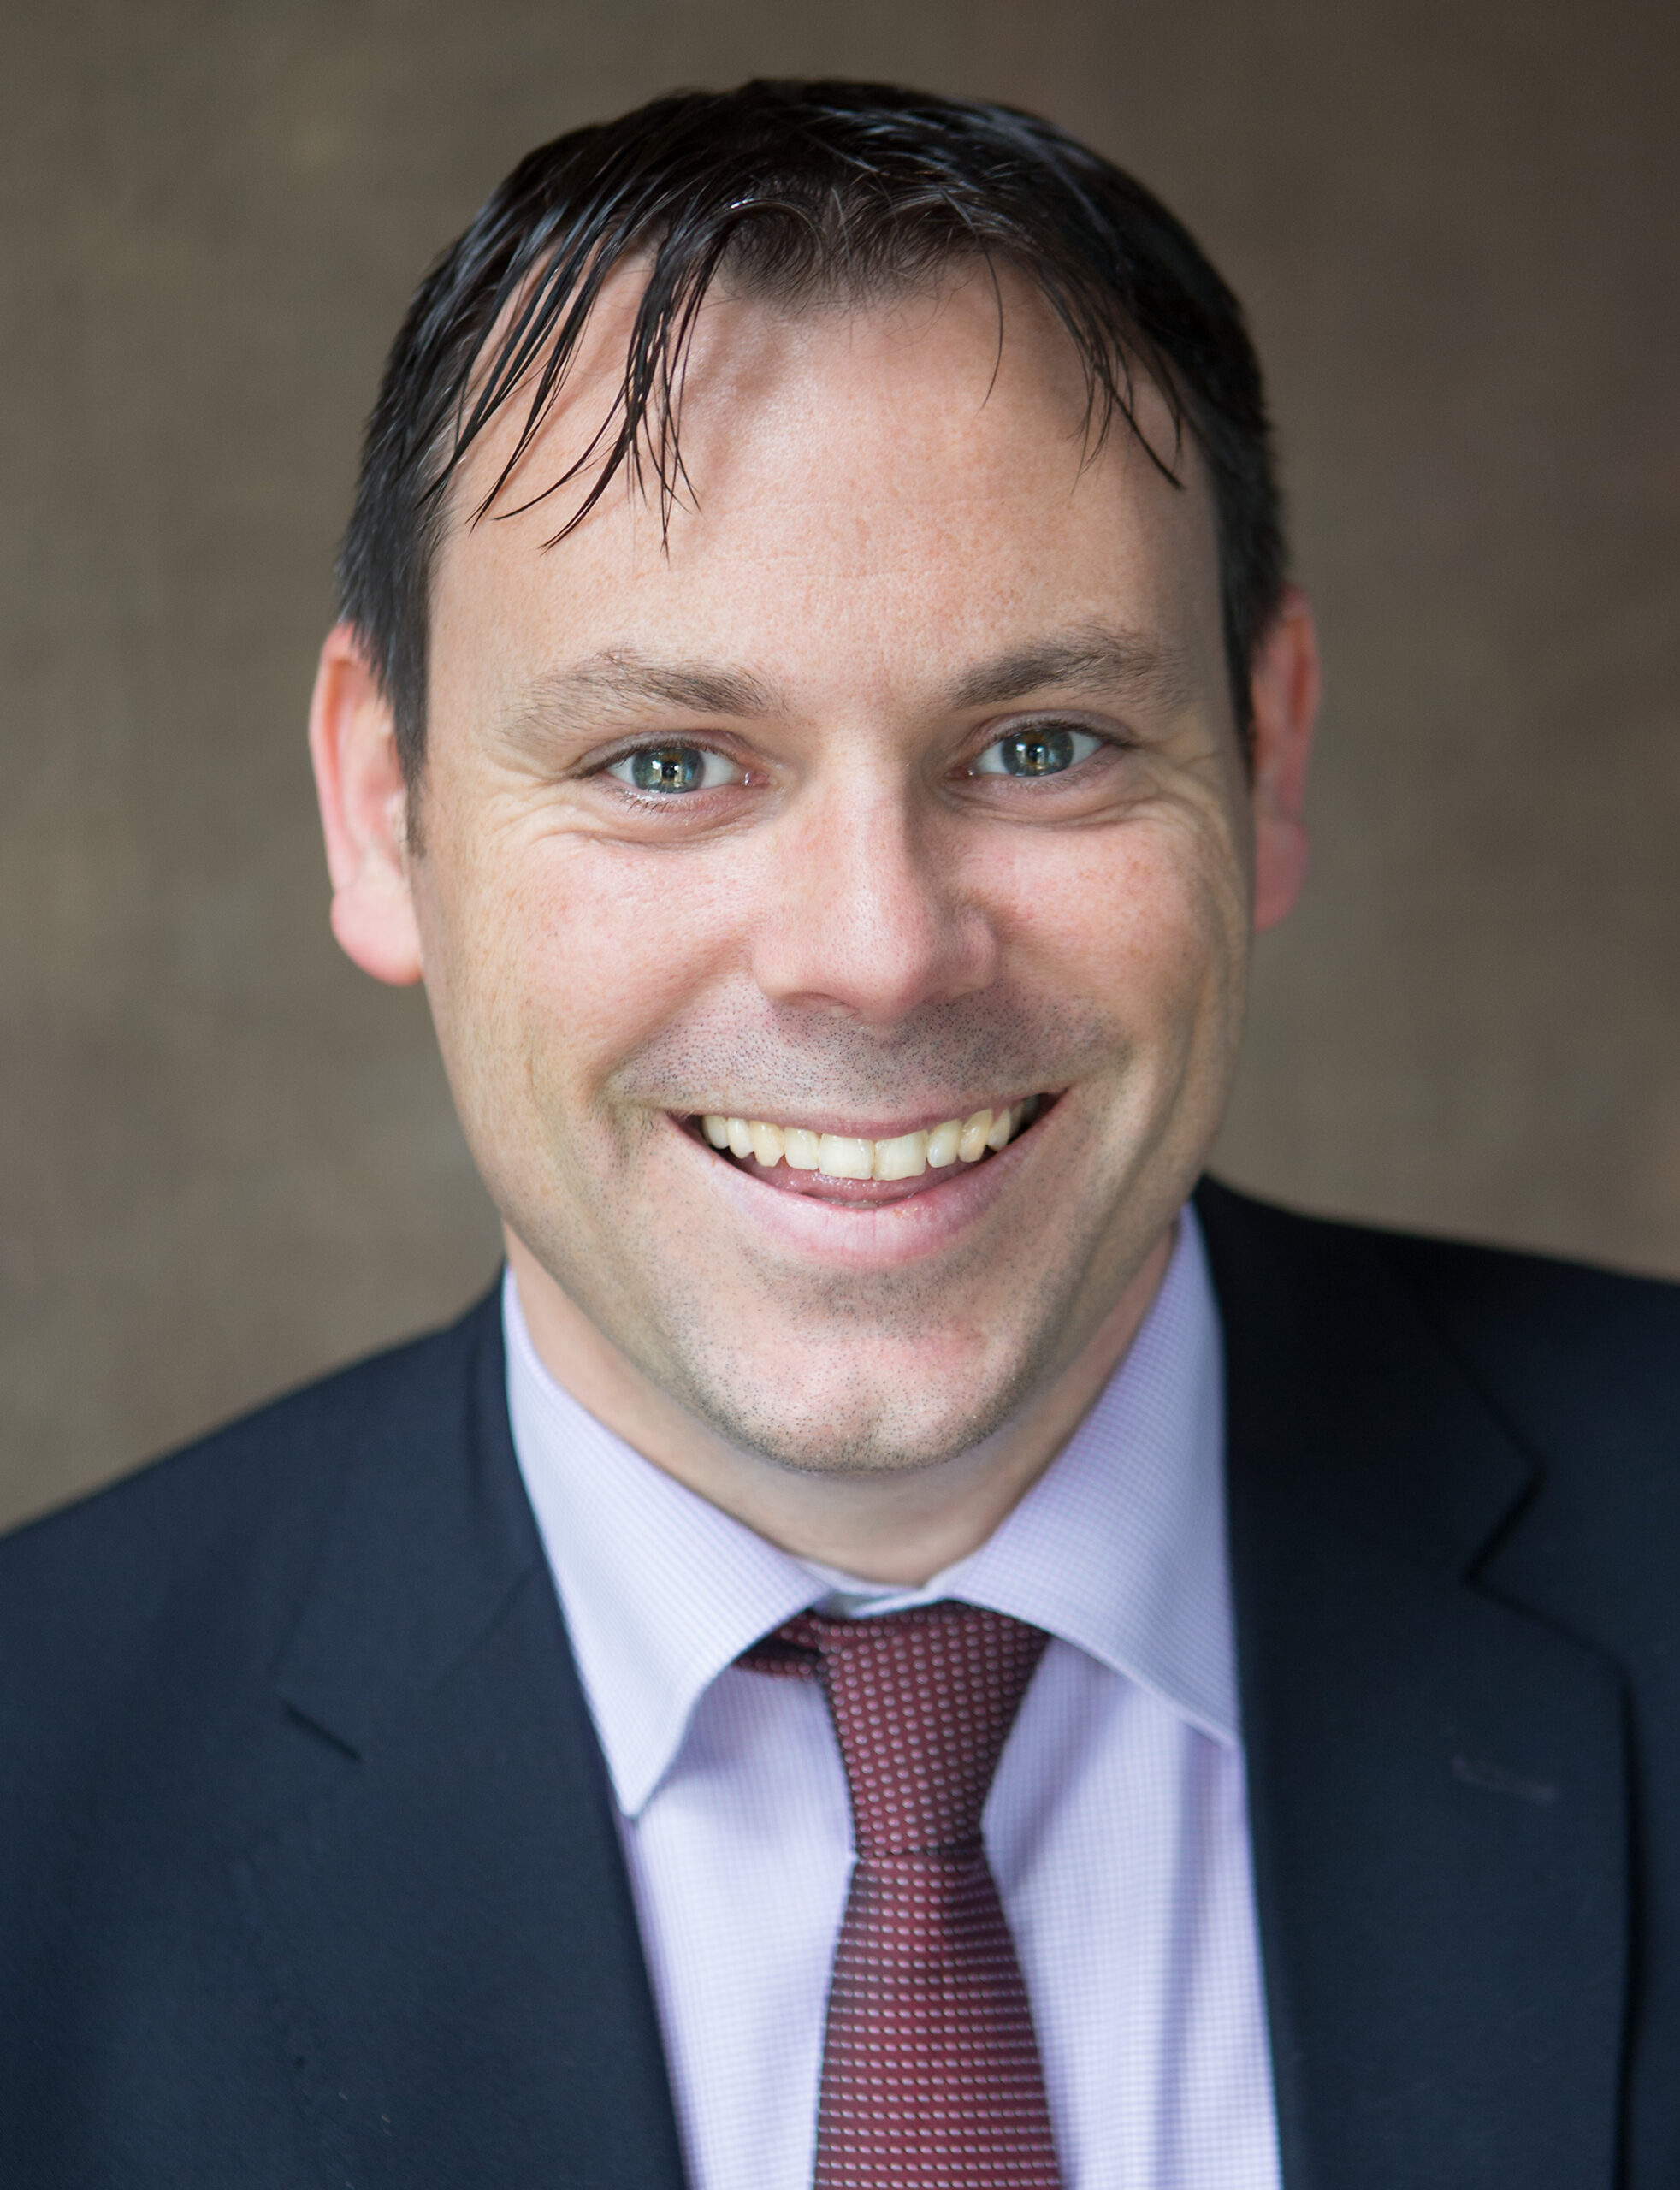 Kieran Mulcahy